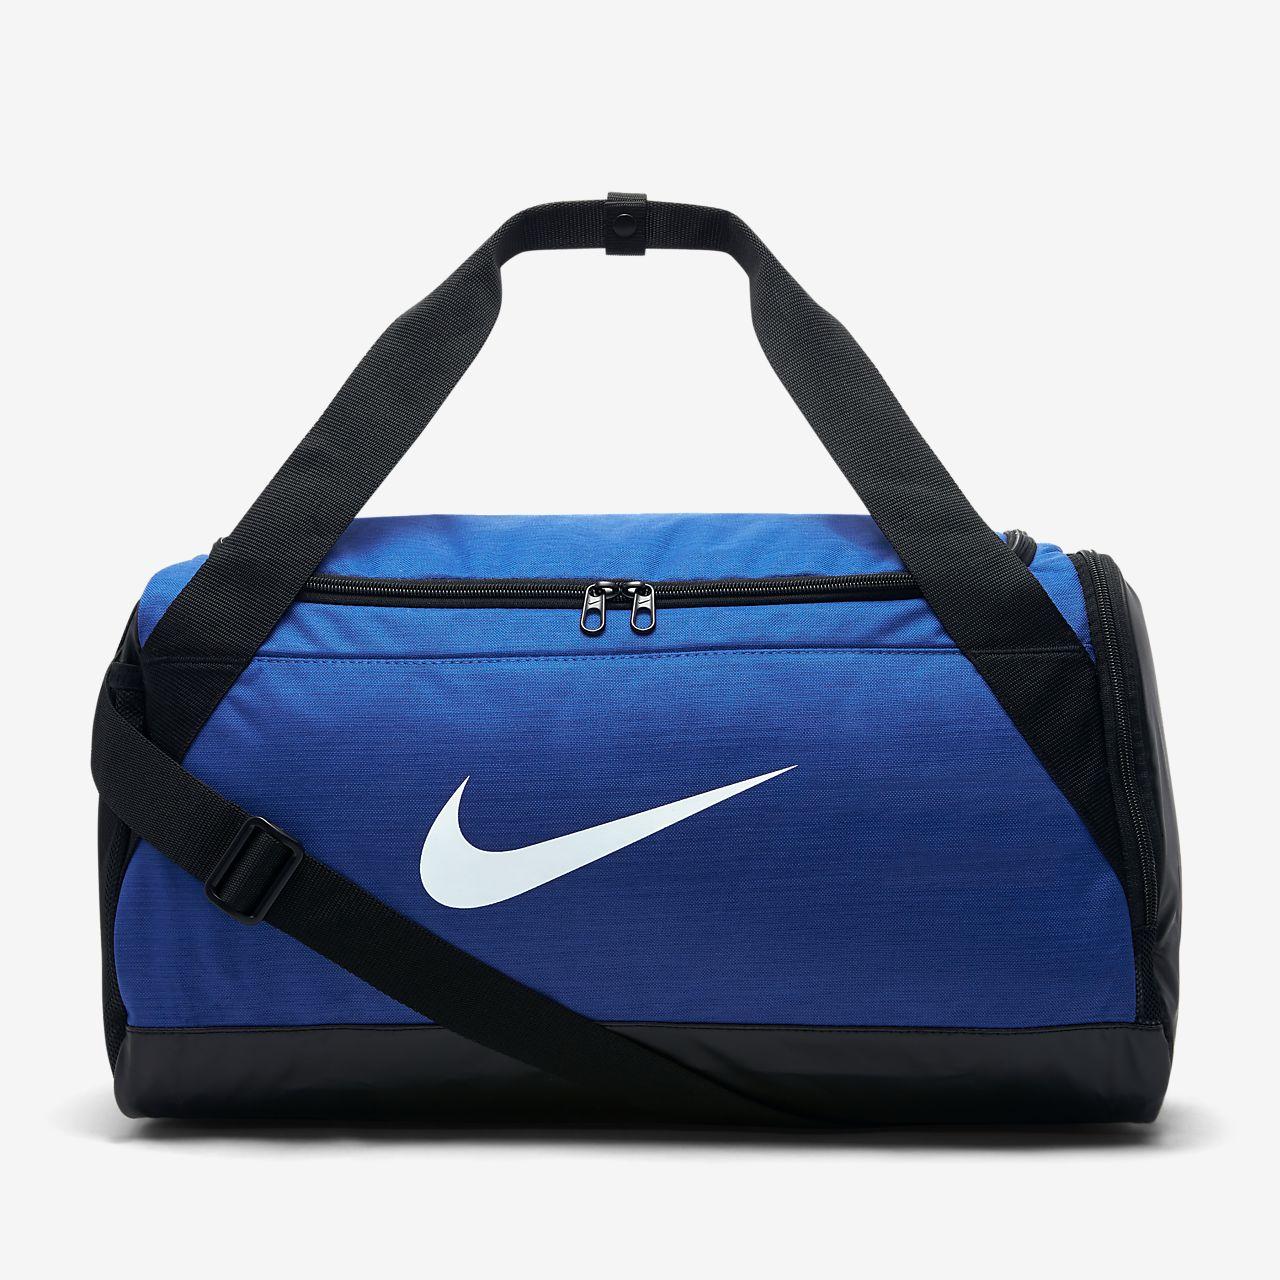 Nike Brasilia (Small) Antrenman Spor Çantası